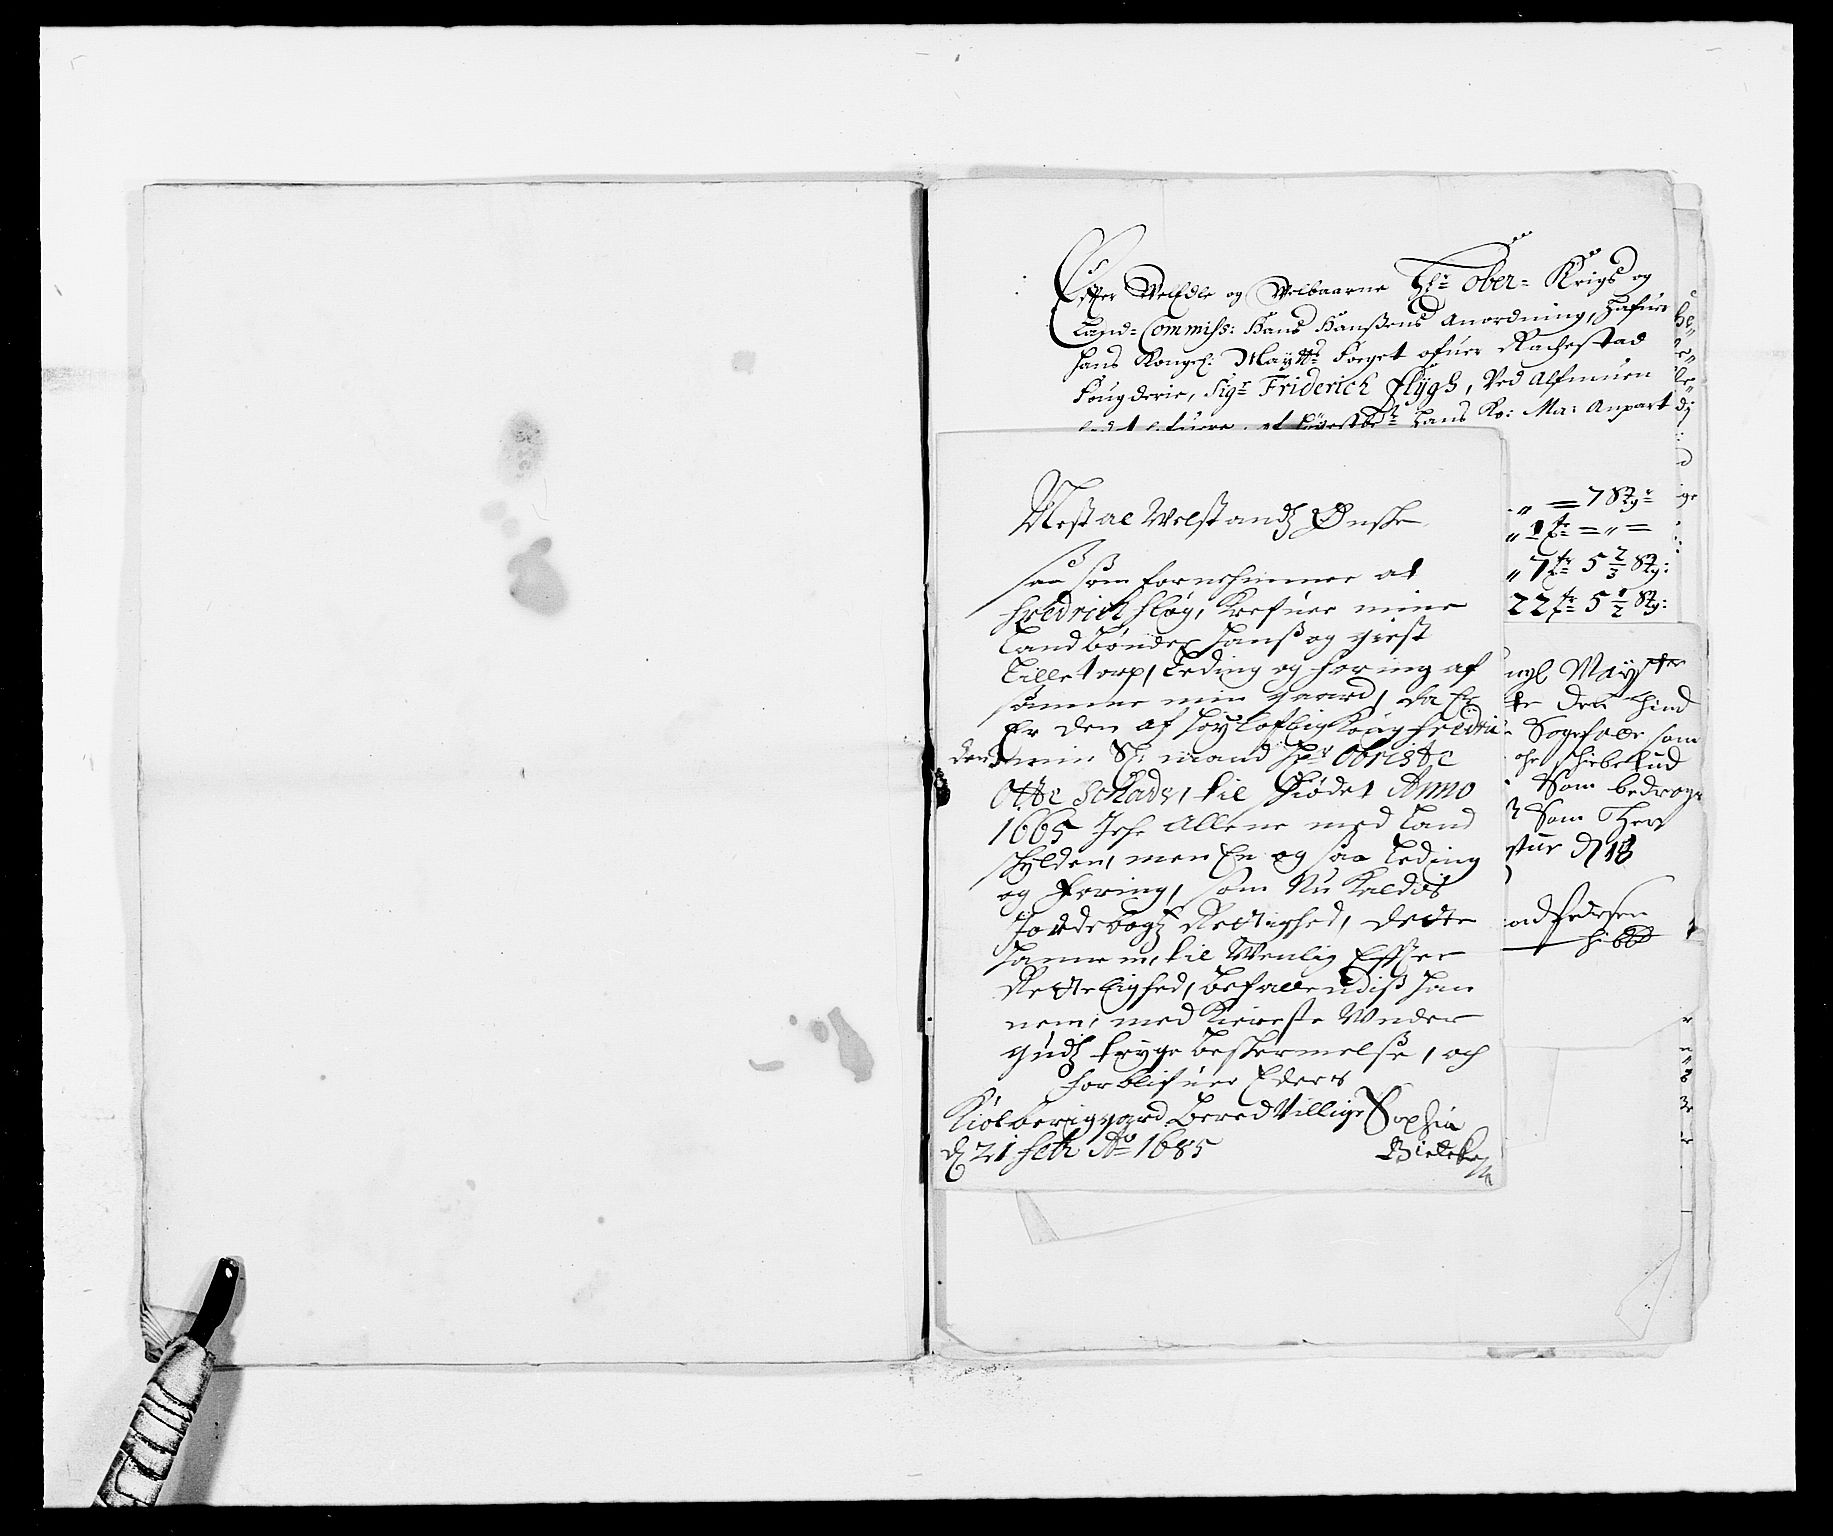 RA, Rentekammeret inntil 1814, Reviderte regnskaper, Fogderegnskap, R05/L0274: Fogderegnskap Rakkestad, 1683-1684, s. 398